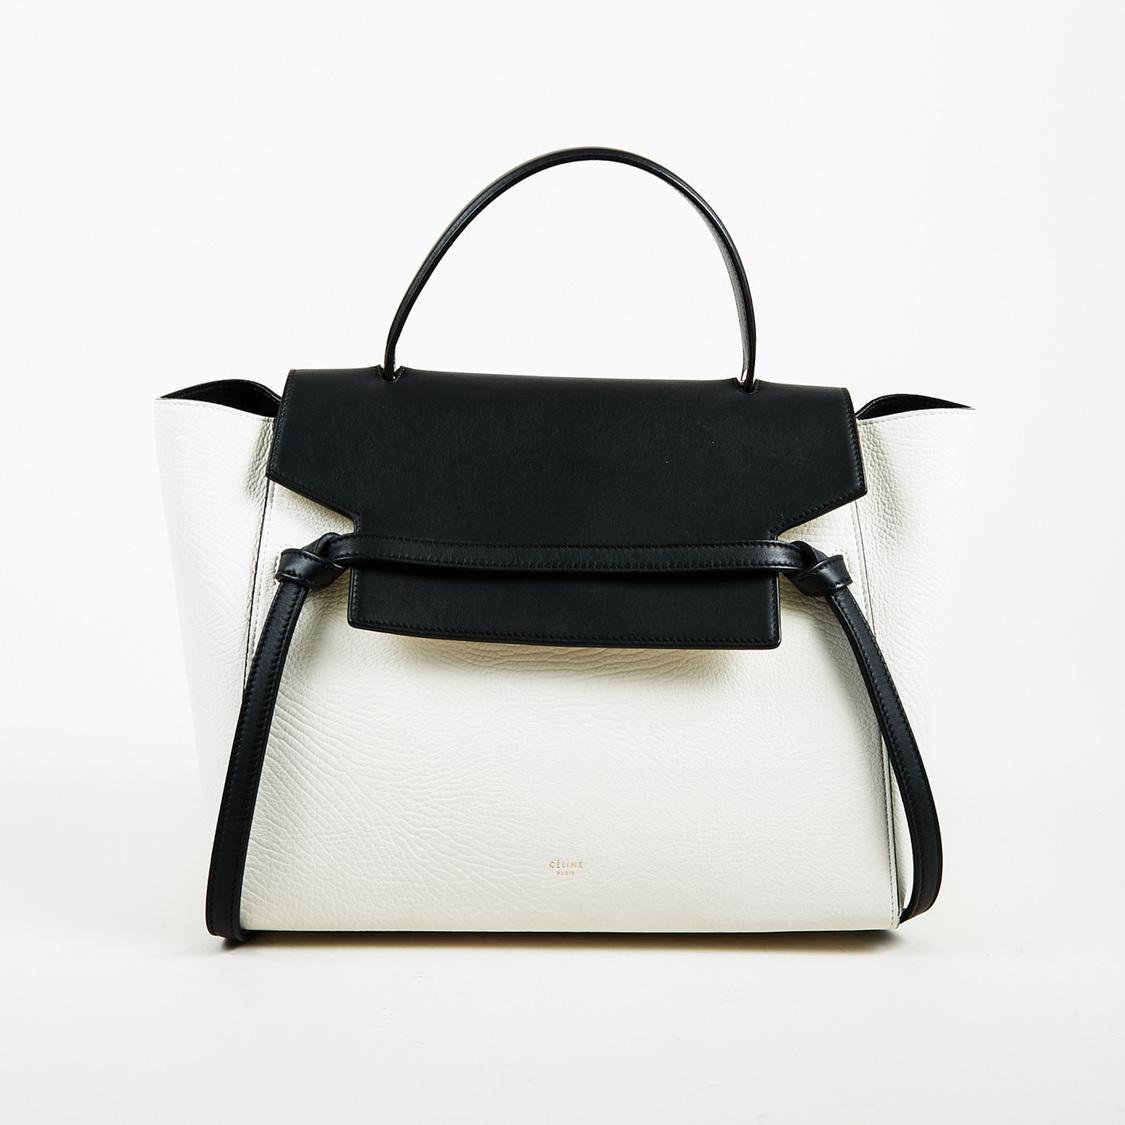 Céline. Women s White   Black Leather Bi Textured Top Handle Mini